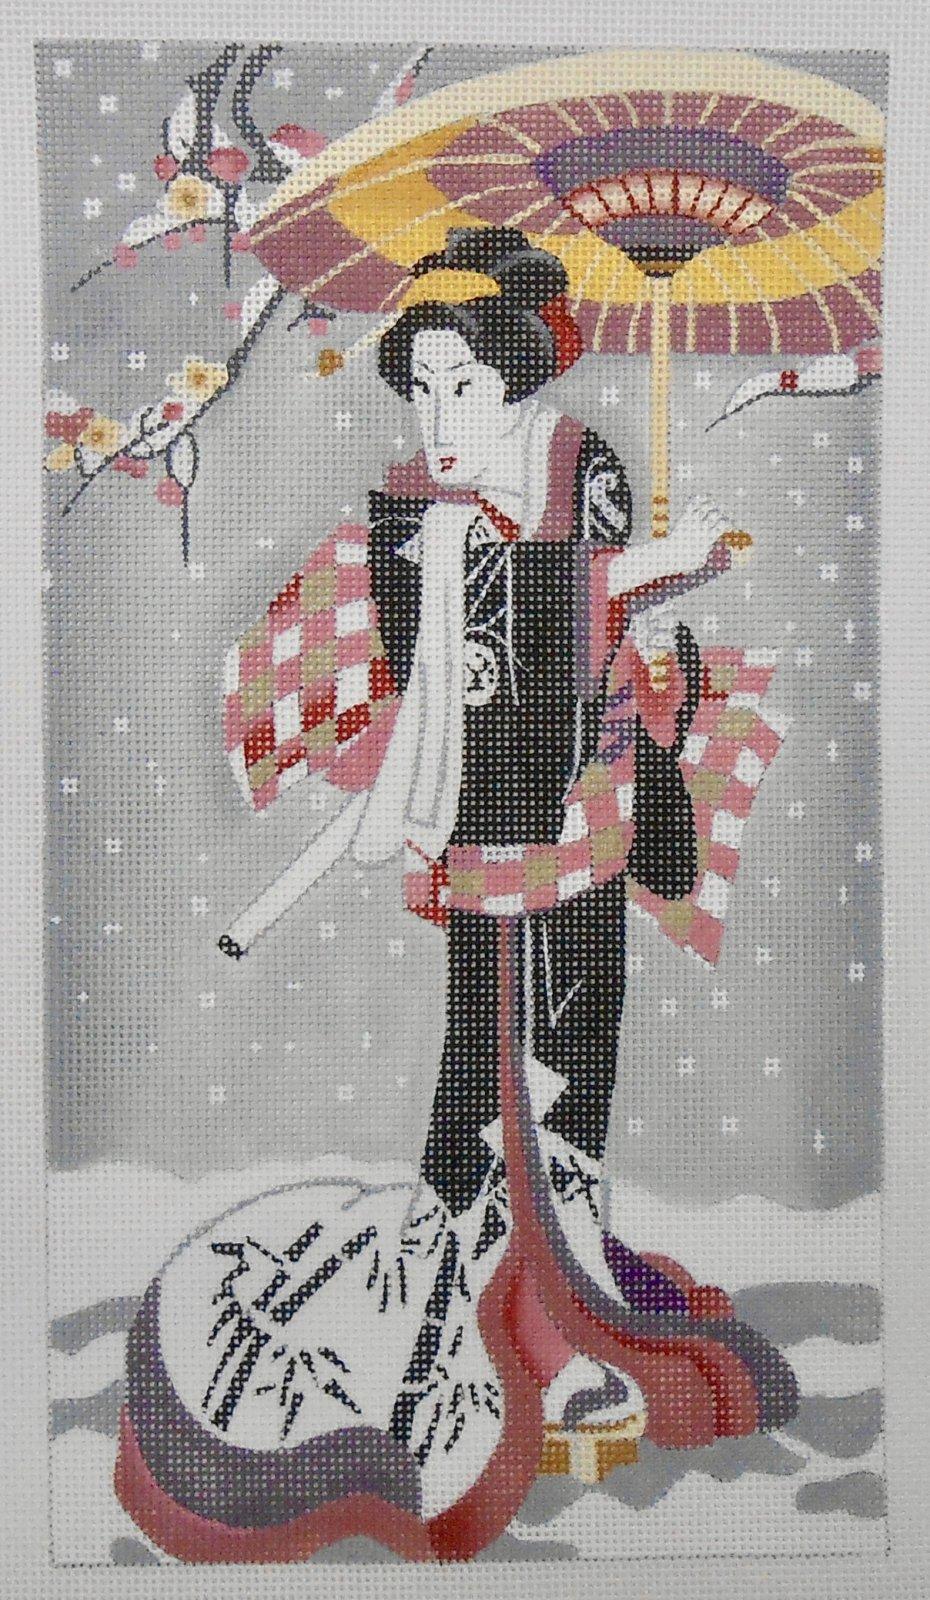 Geisha with a Parasol